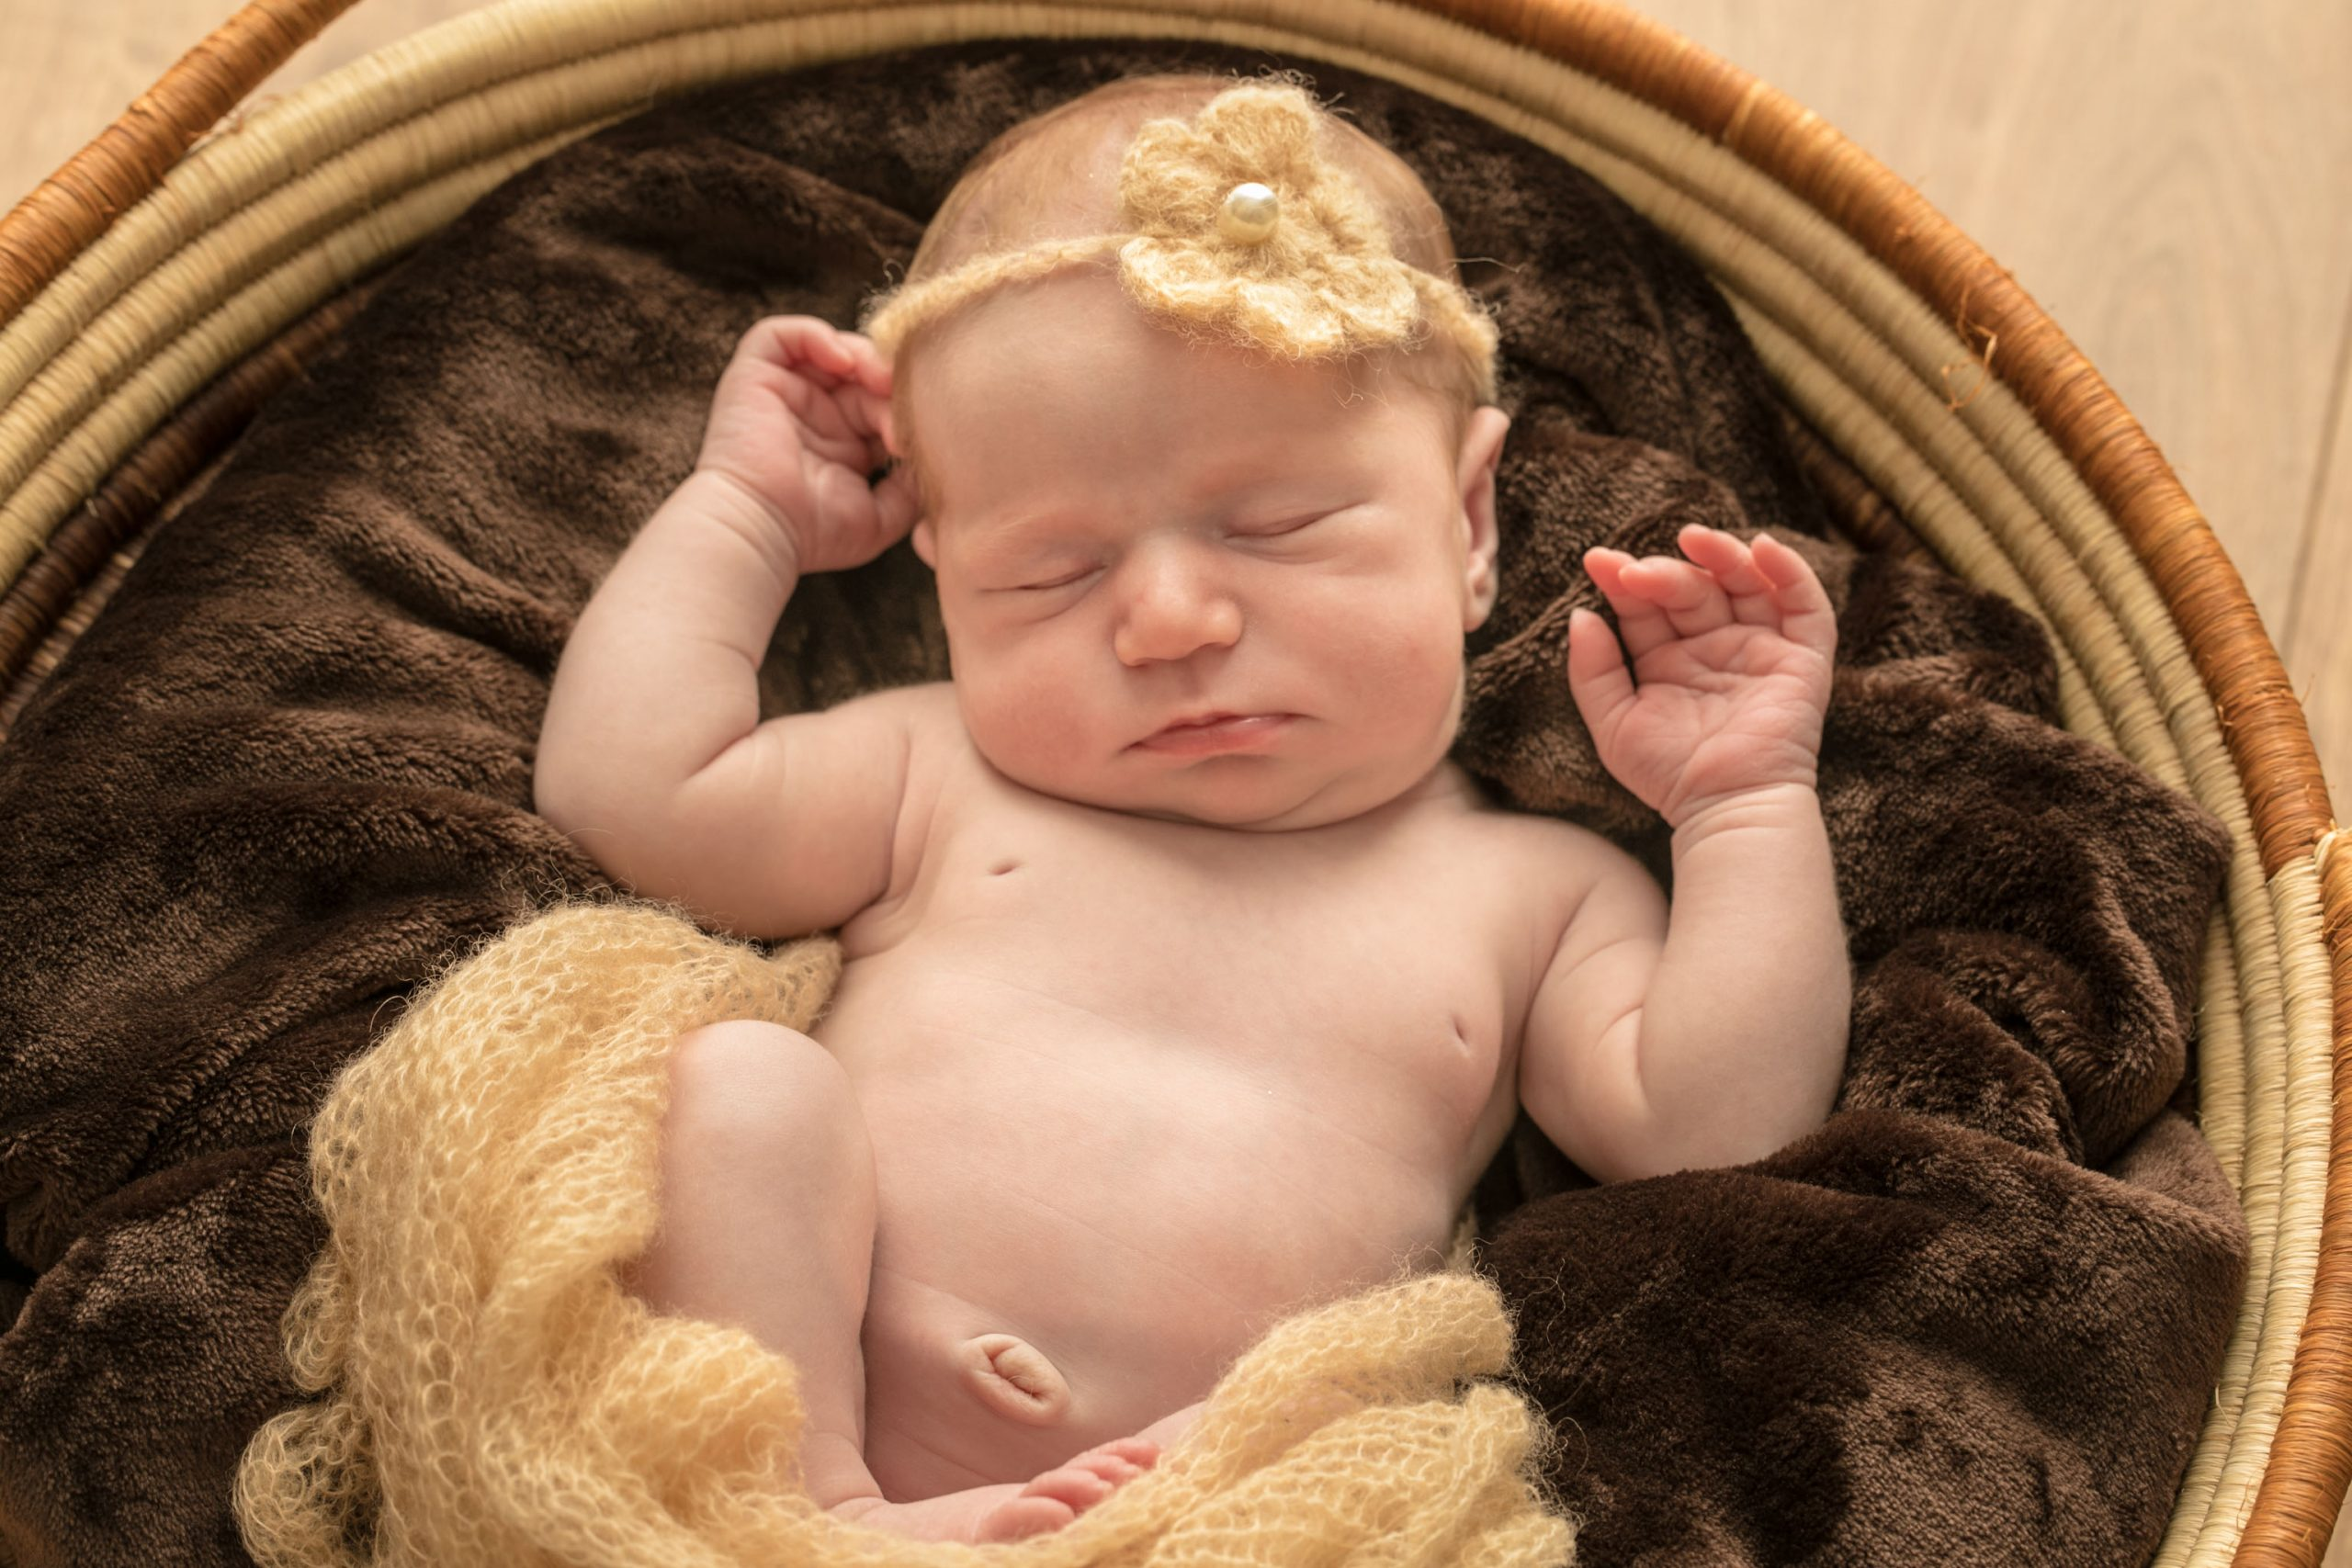 Newborn Session with Baby Sophia, Tania Miller Photography, Pontypool Newborn Photographer